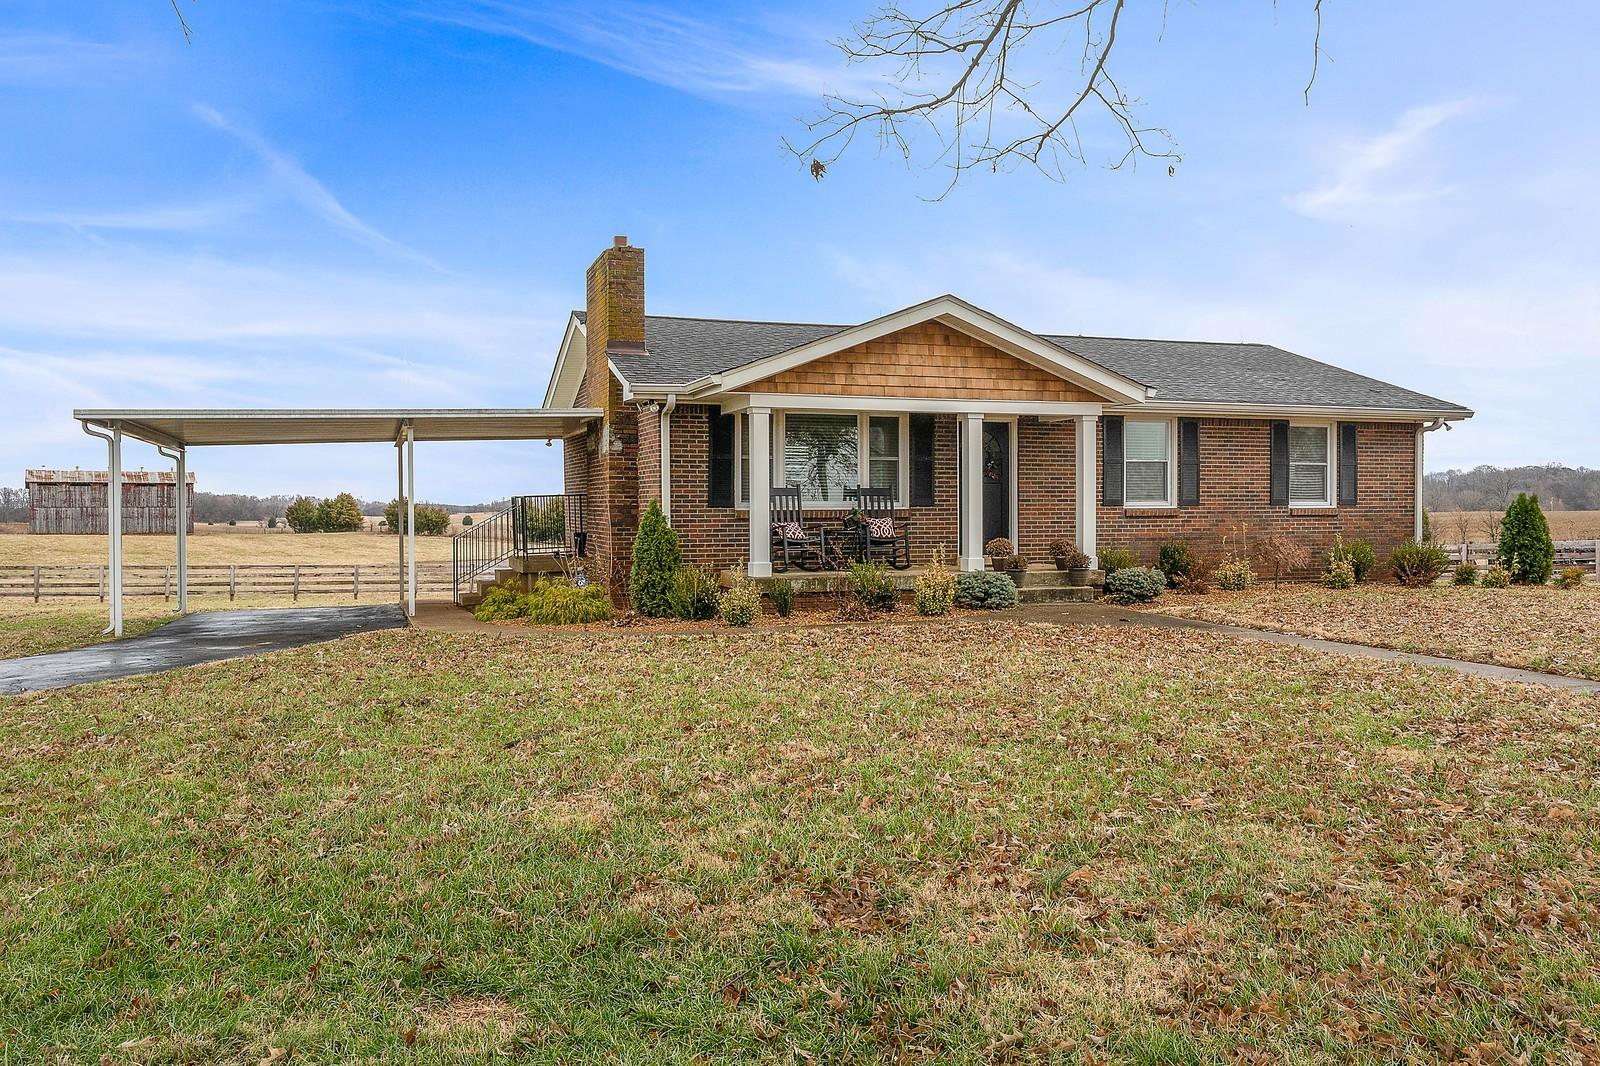 6253 Highway 161, Springfield, TN 37172 - Springfield, TN real estate listing